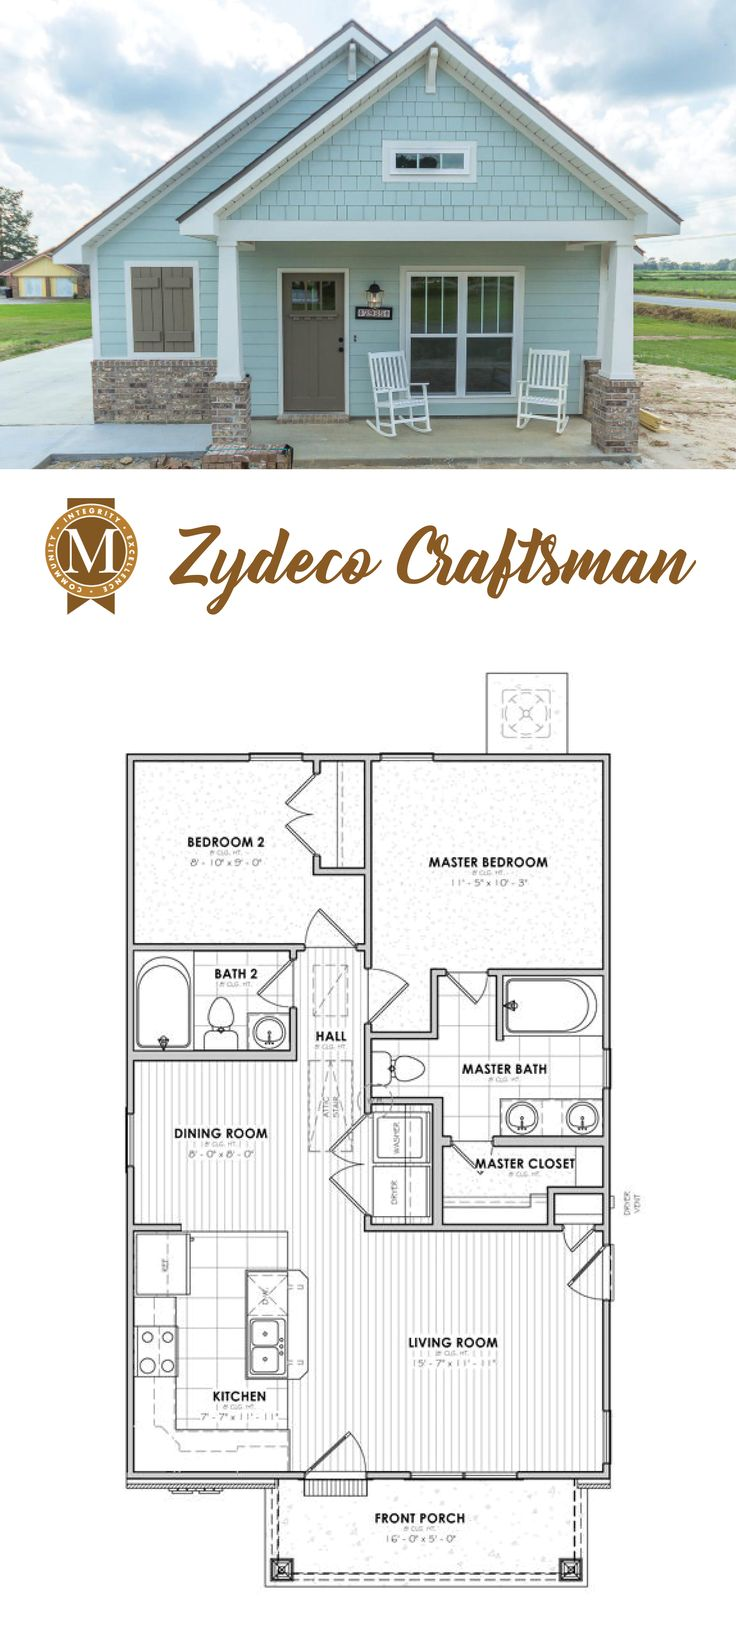 Living Sq Ft: 868 Bedrooms: 2 Baths: 2 Lake Charles Lafayette Louisiana Baton Rouge